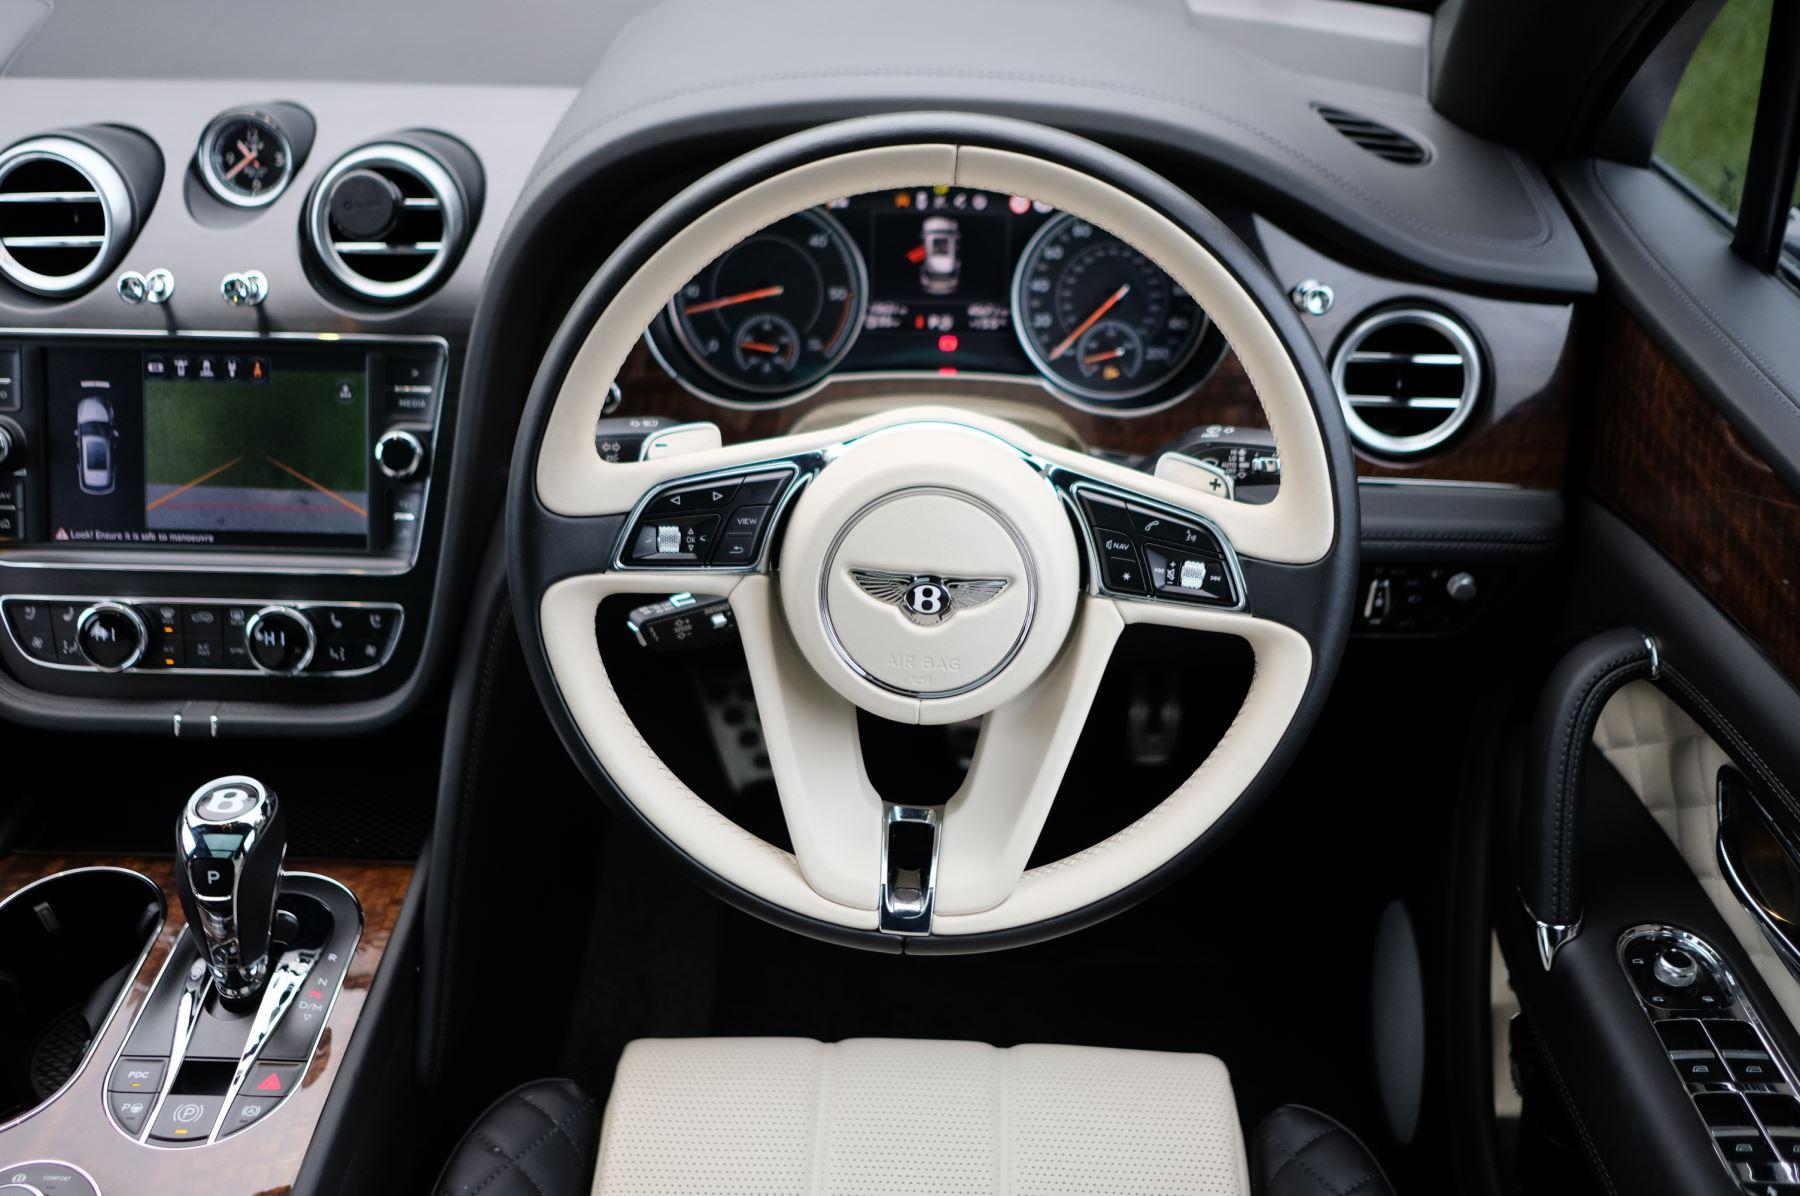 Bentley Bentayga Diesel 4.0 V8 Mulliner Driving Spec 5dr Auto - 7 Seat Specification image 15